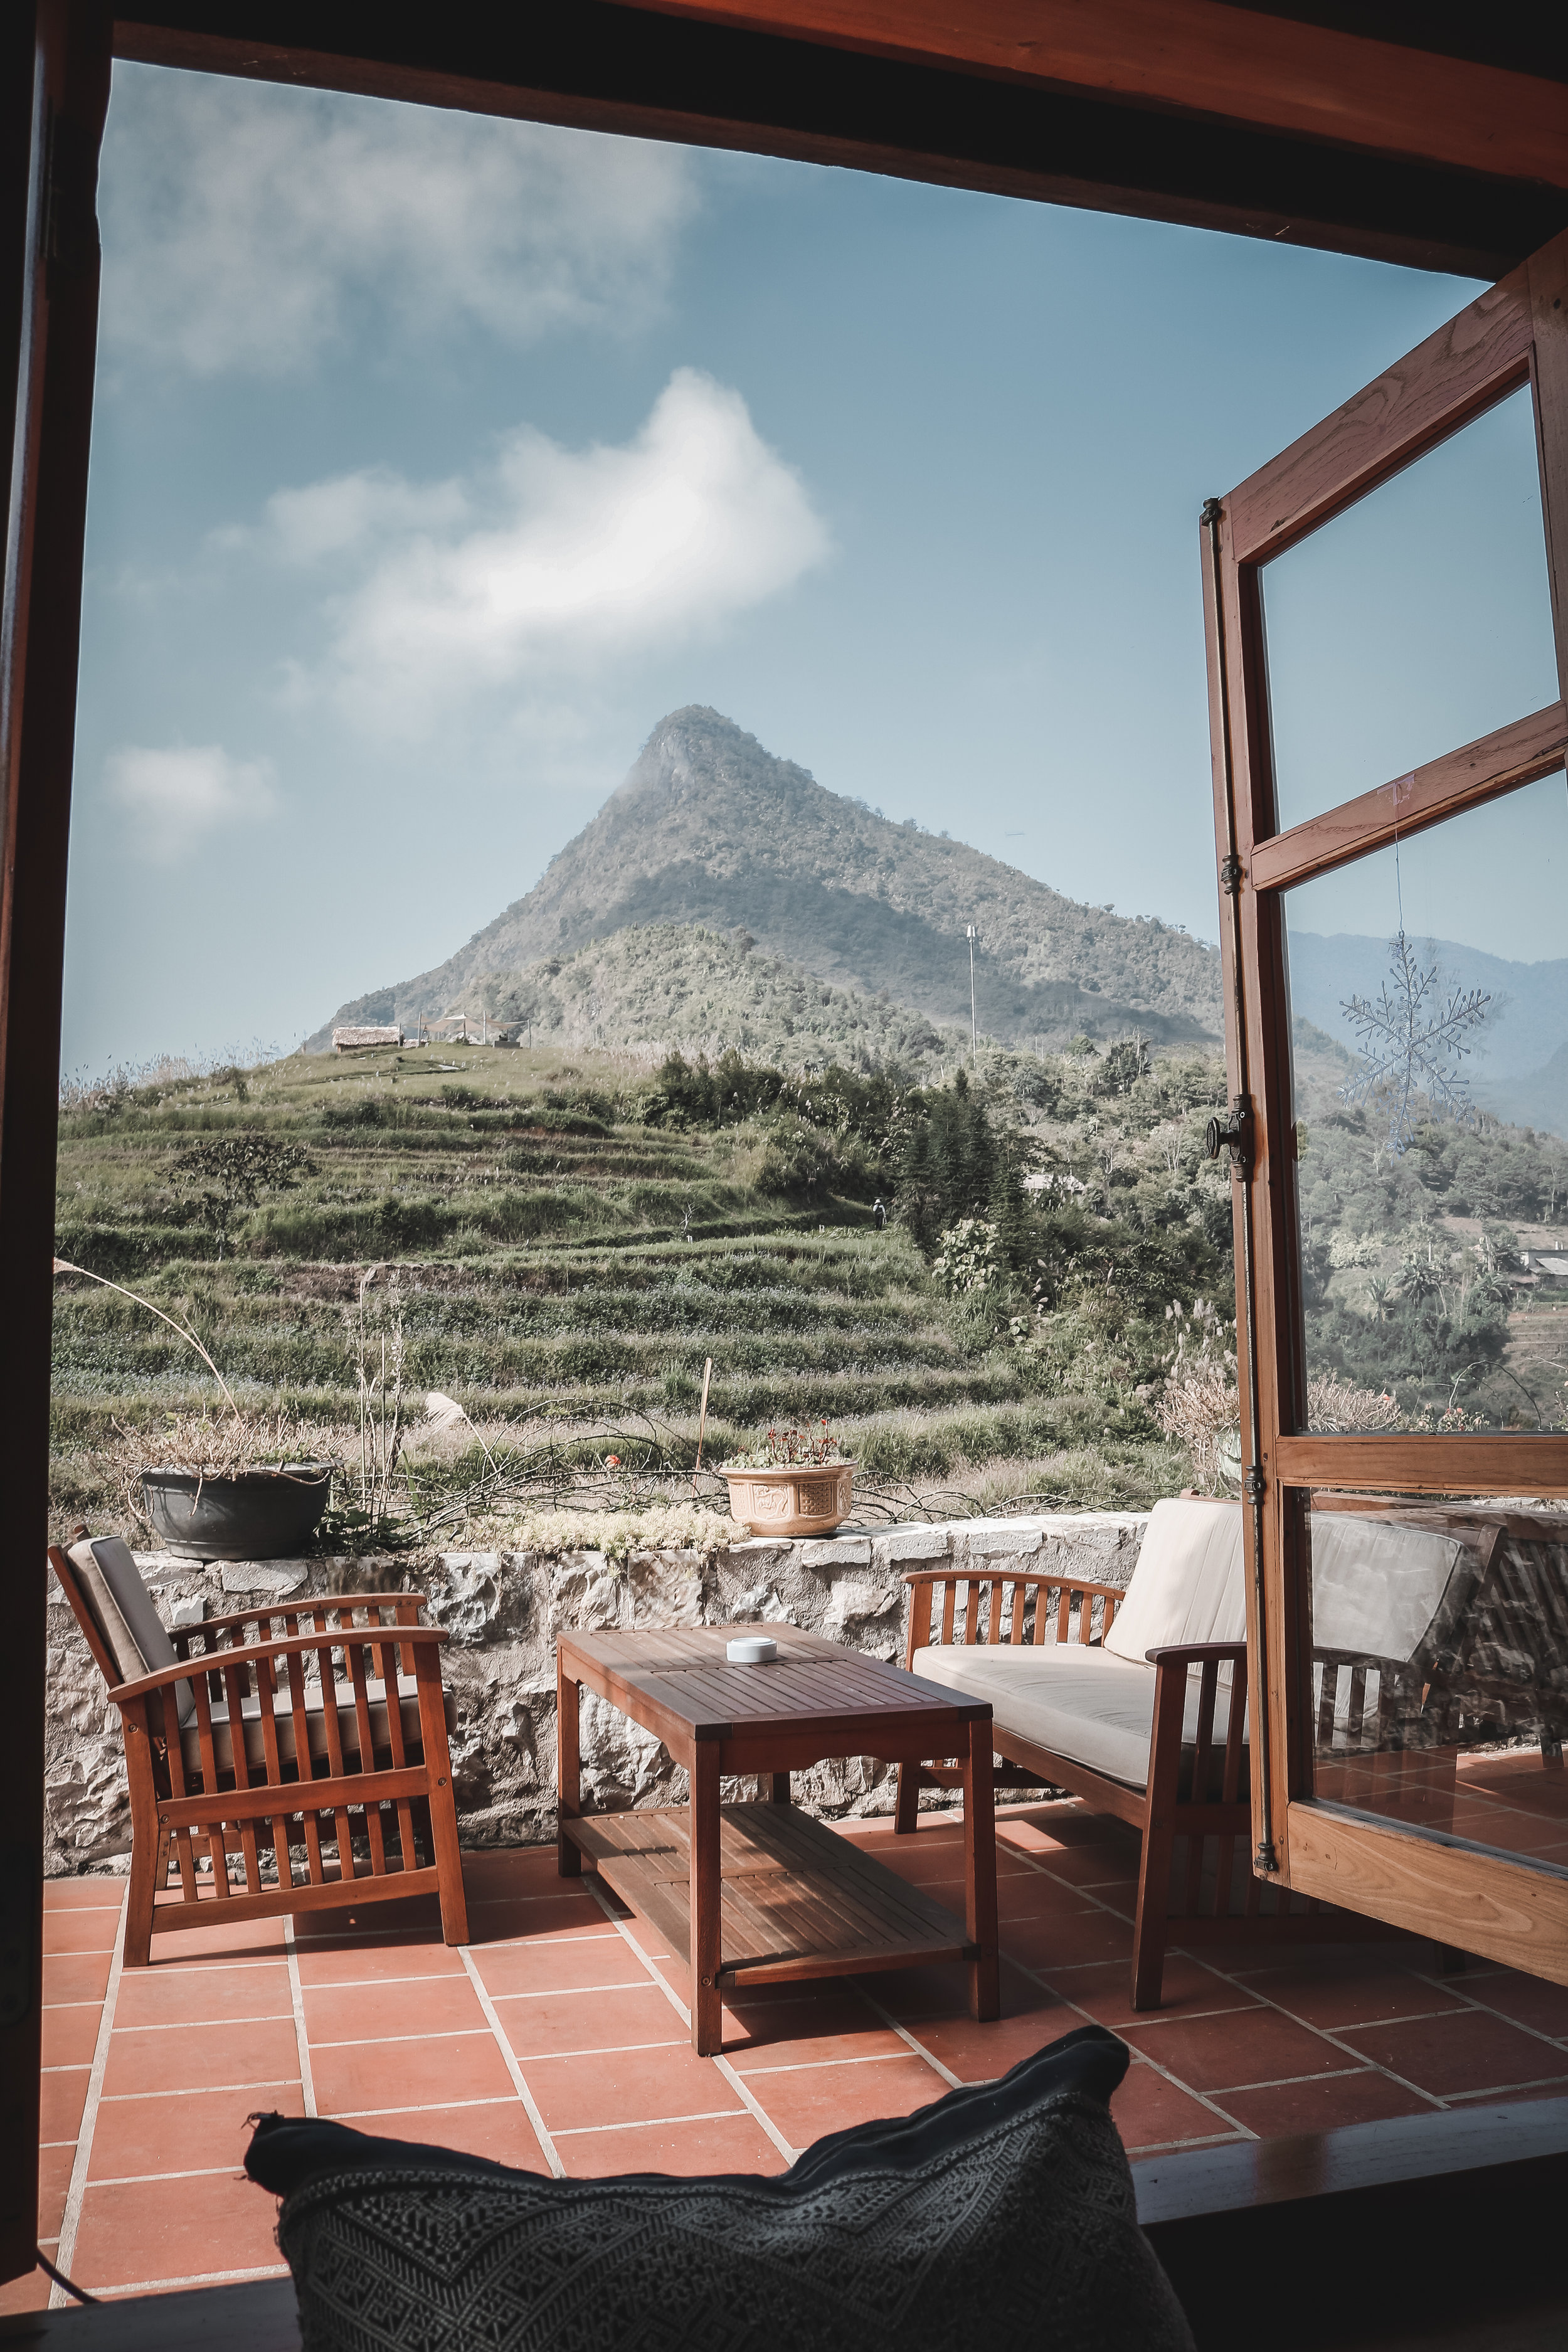 Welcome to Sa Pa - A Mountain Getaway